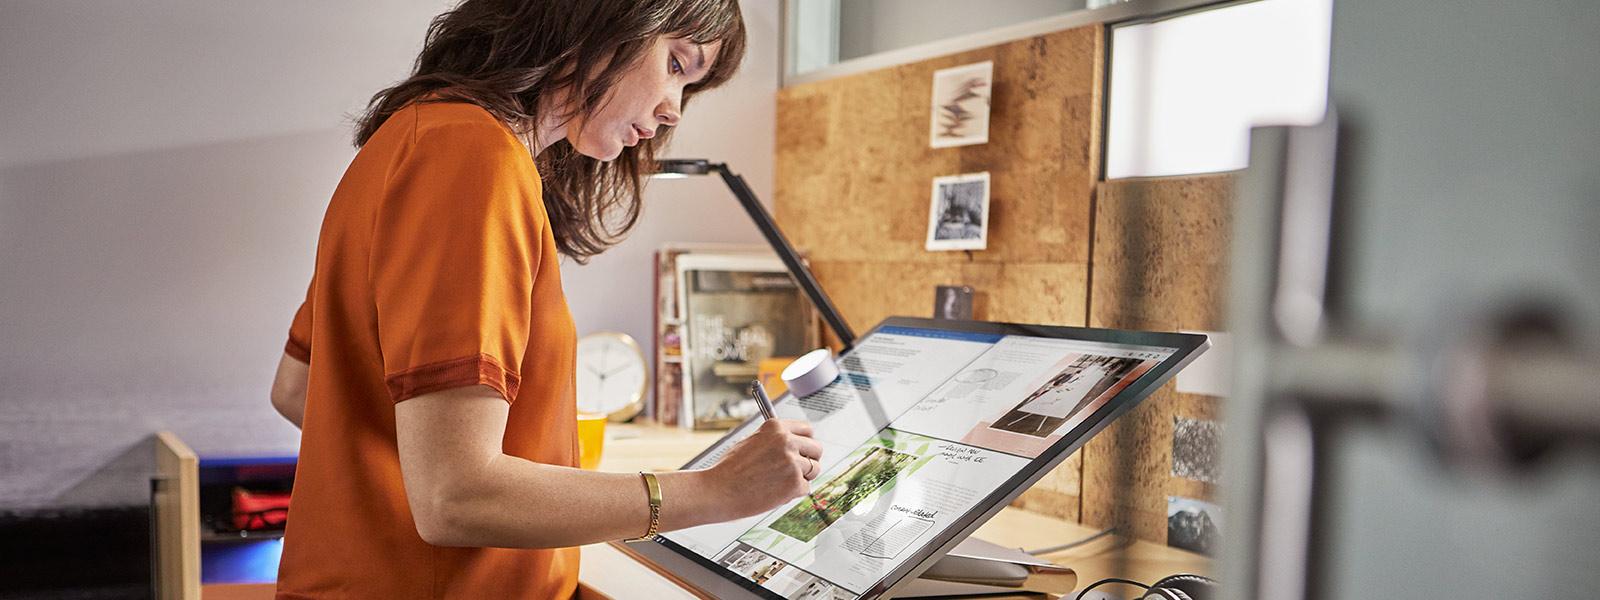 女人在 Surface Studio 上使用手寫筆。